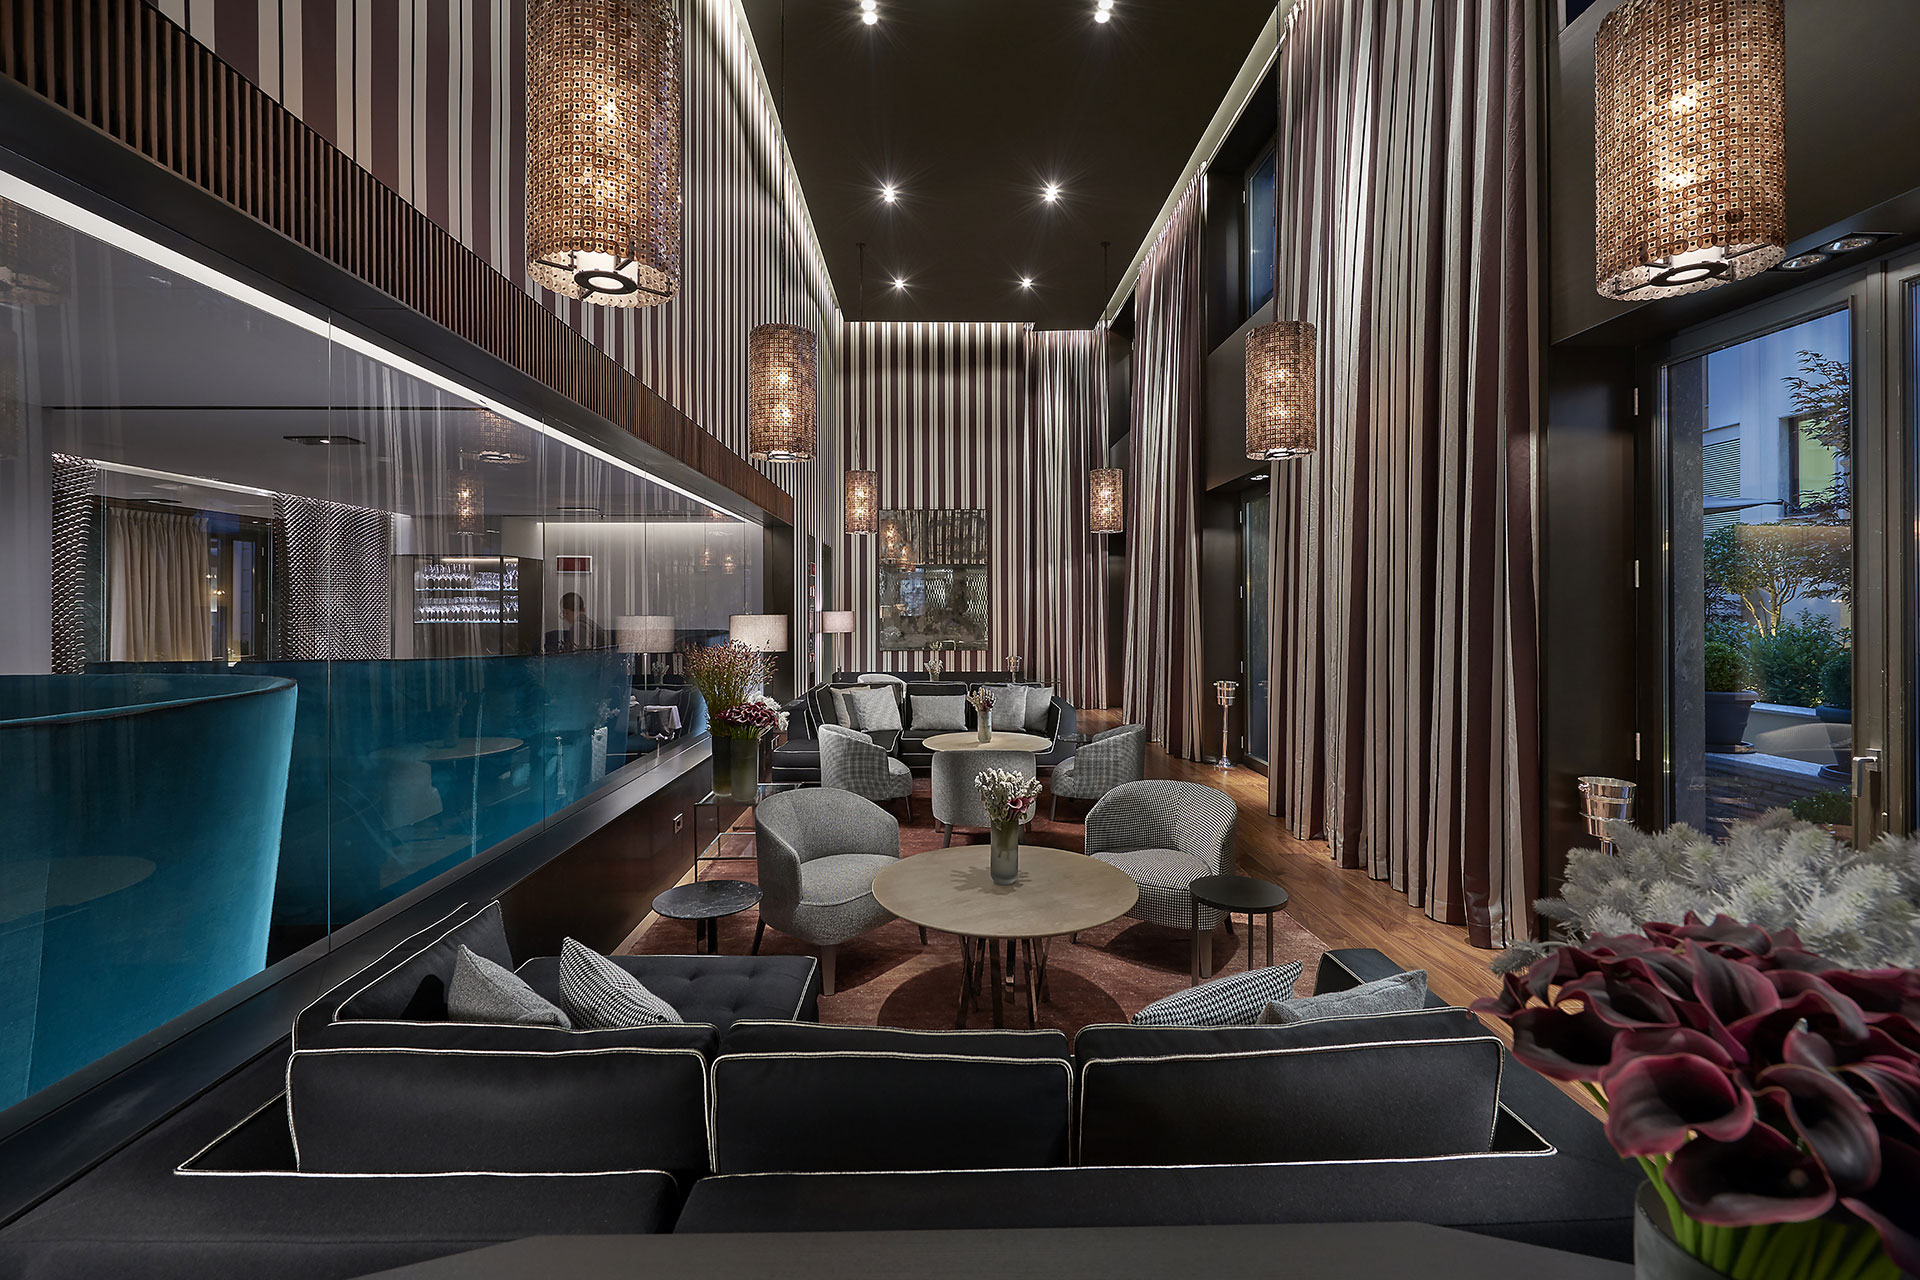 HOTEL MANDARIN ORIENTAL 5